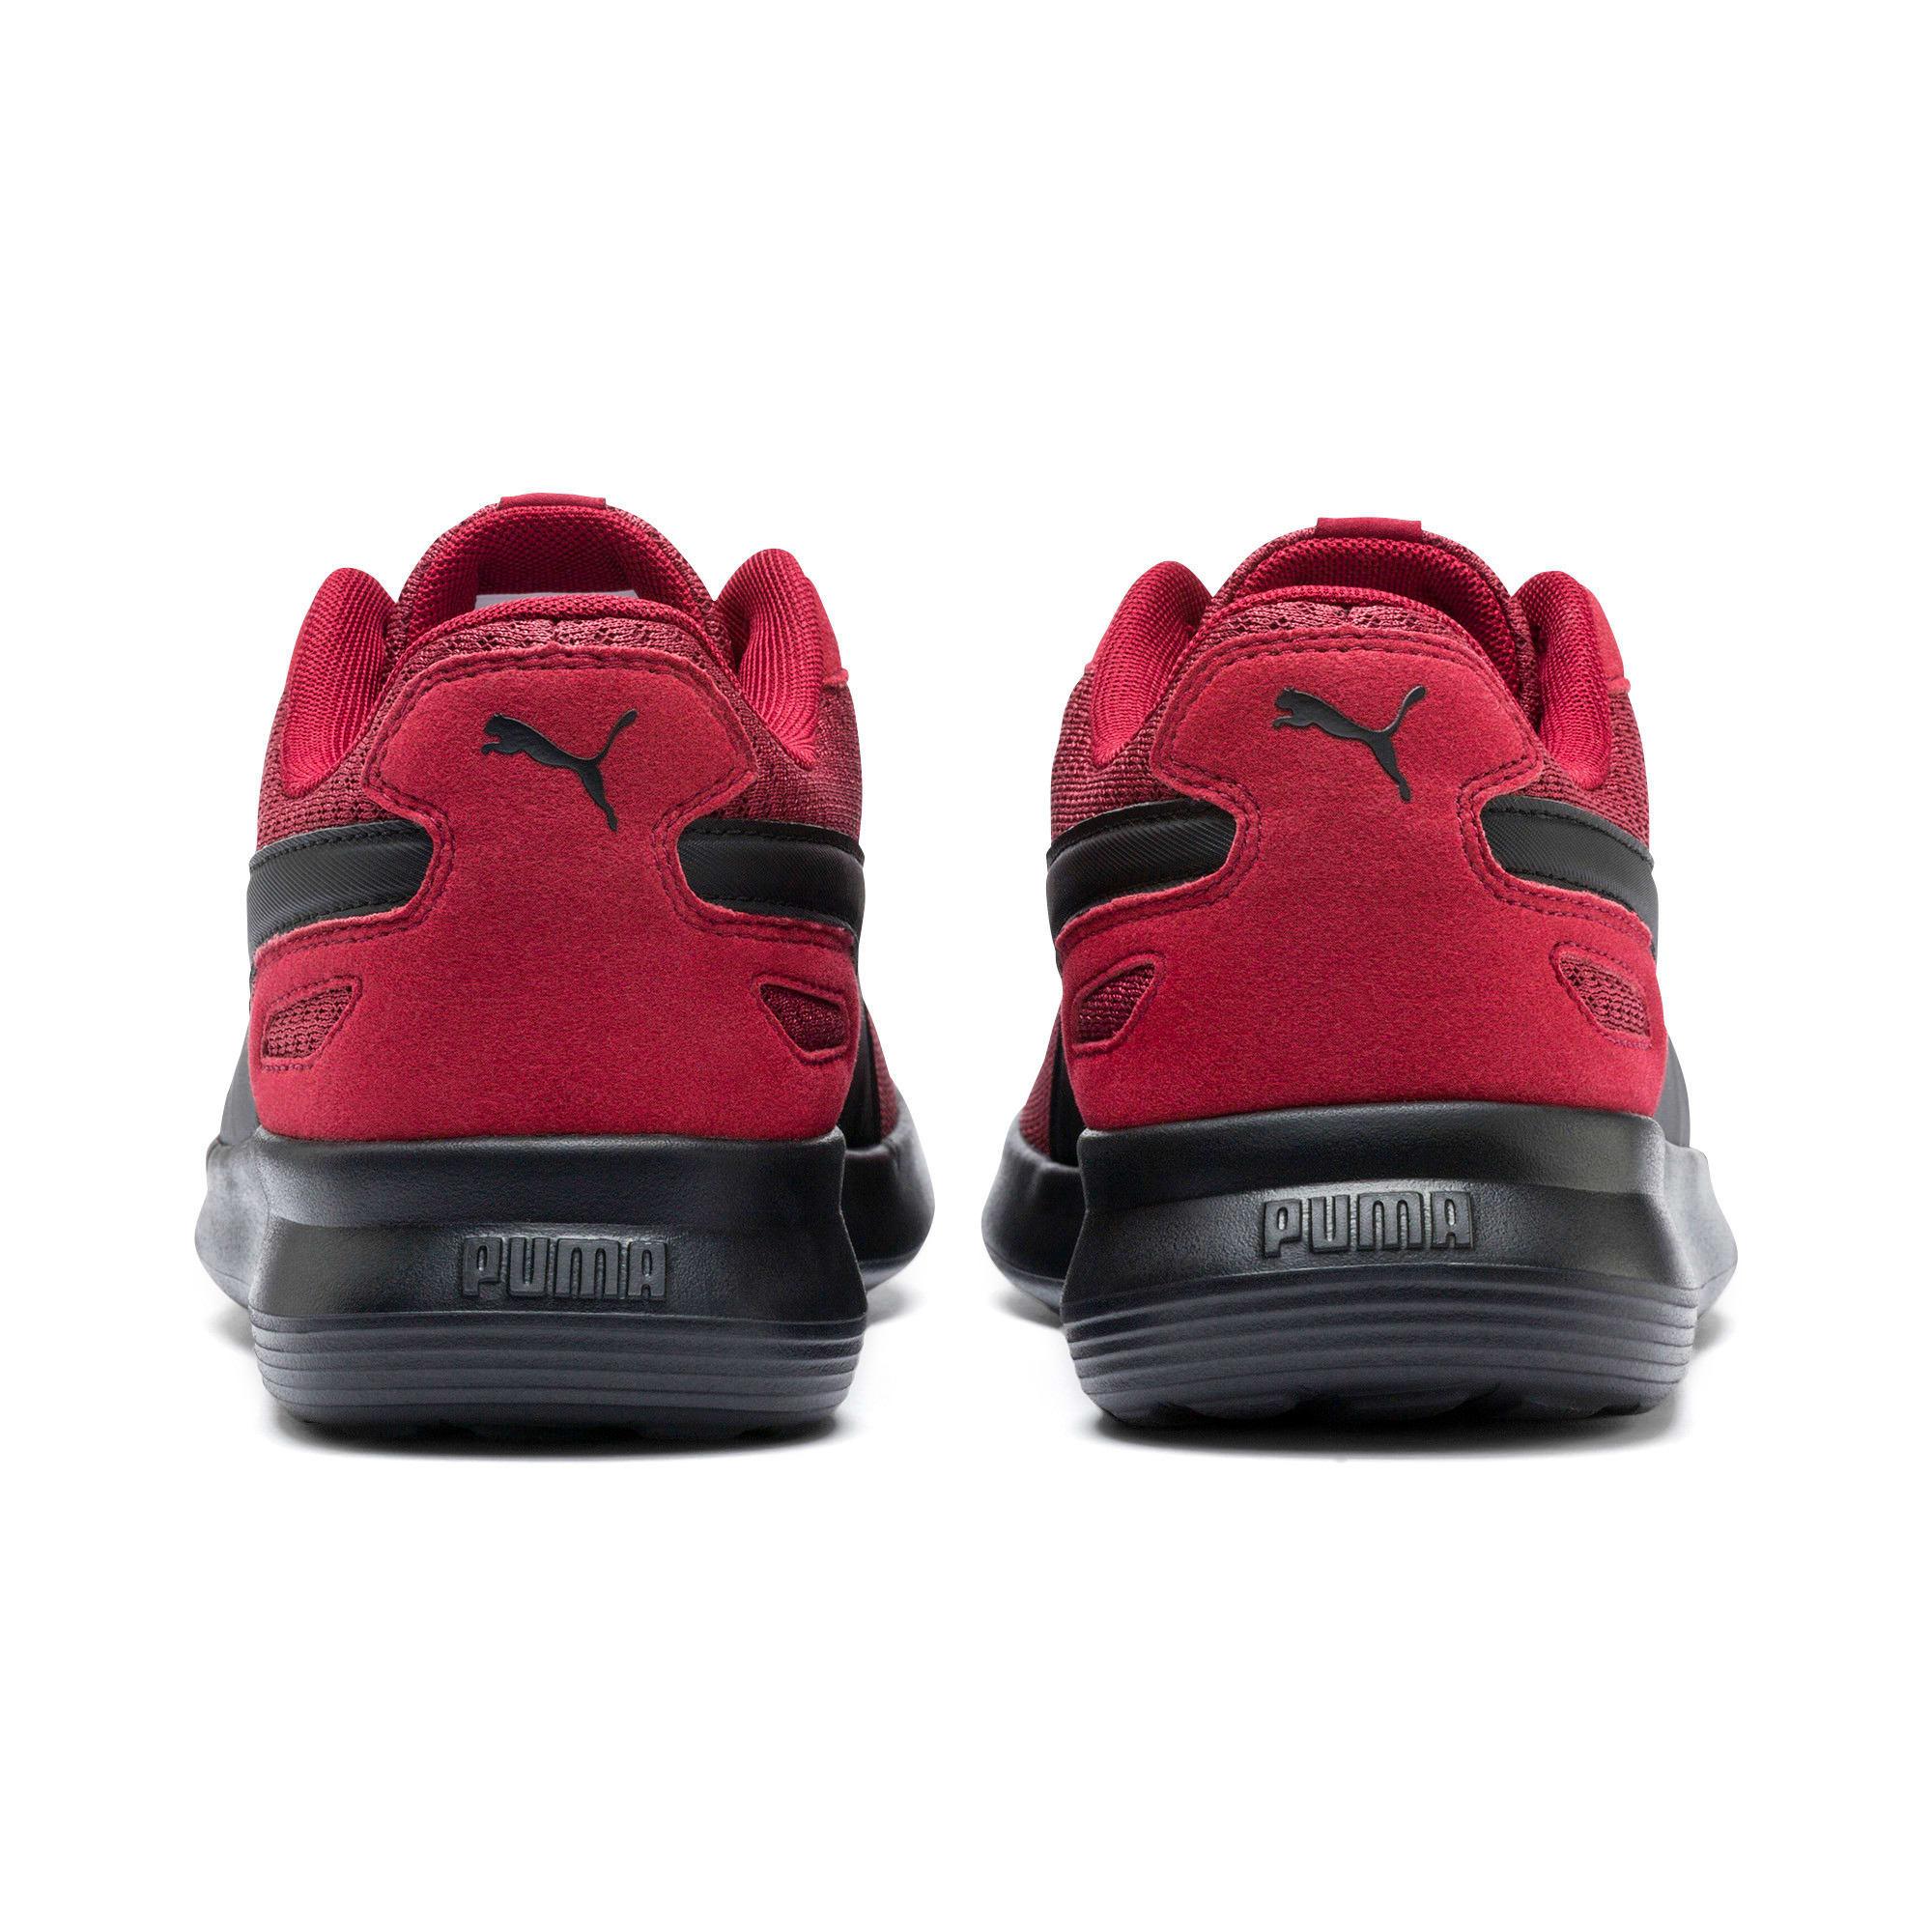 Thumbnail 4 of ST Activate Sneakers, Rhubarb-Puma Black, medium